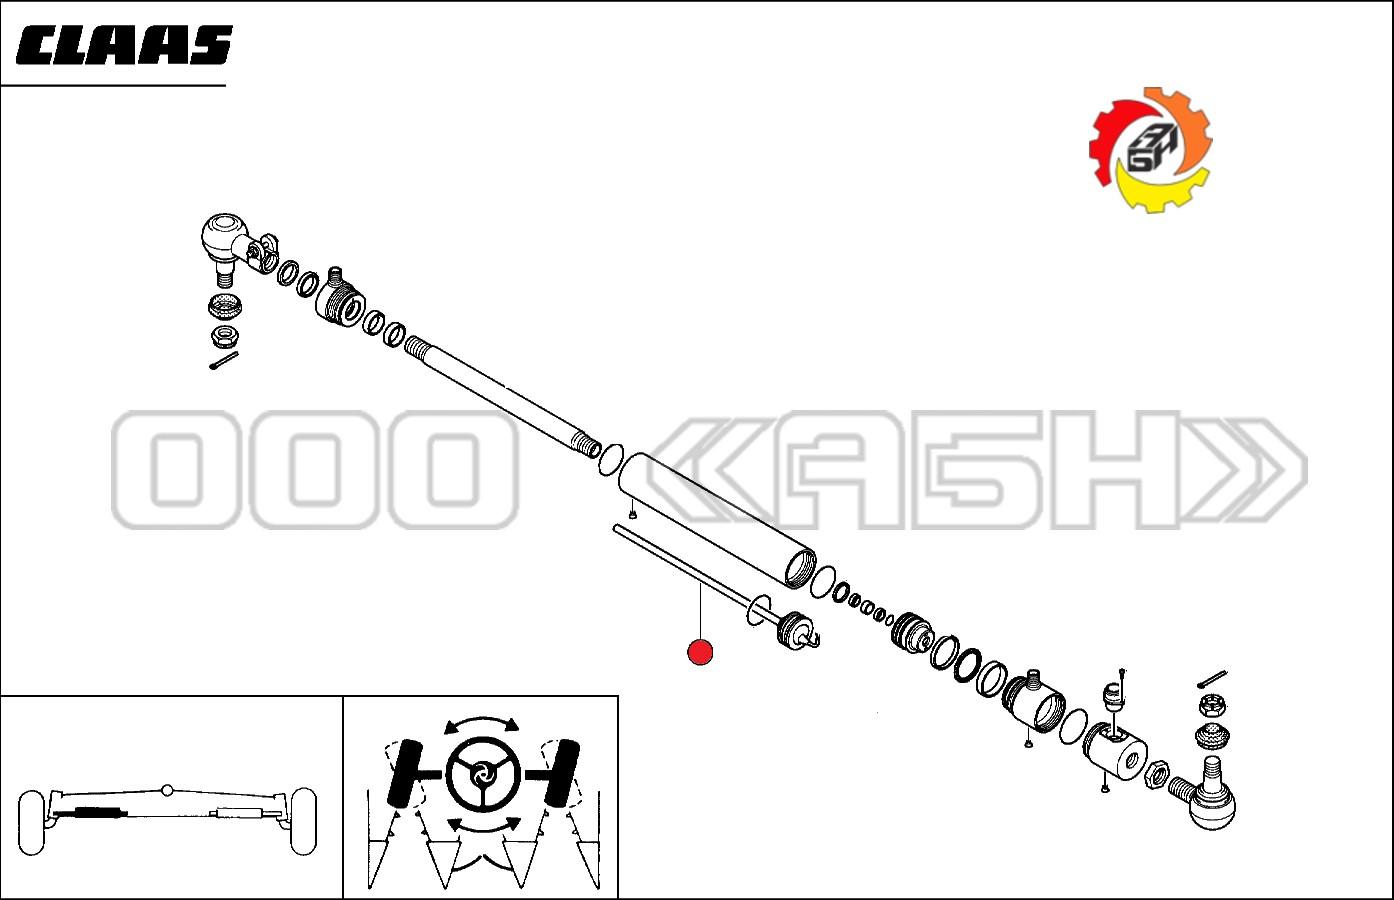 Датчик оборотов Claas (0000530260 / 0530260 / 053026.0)